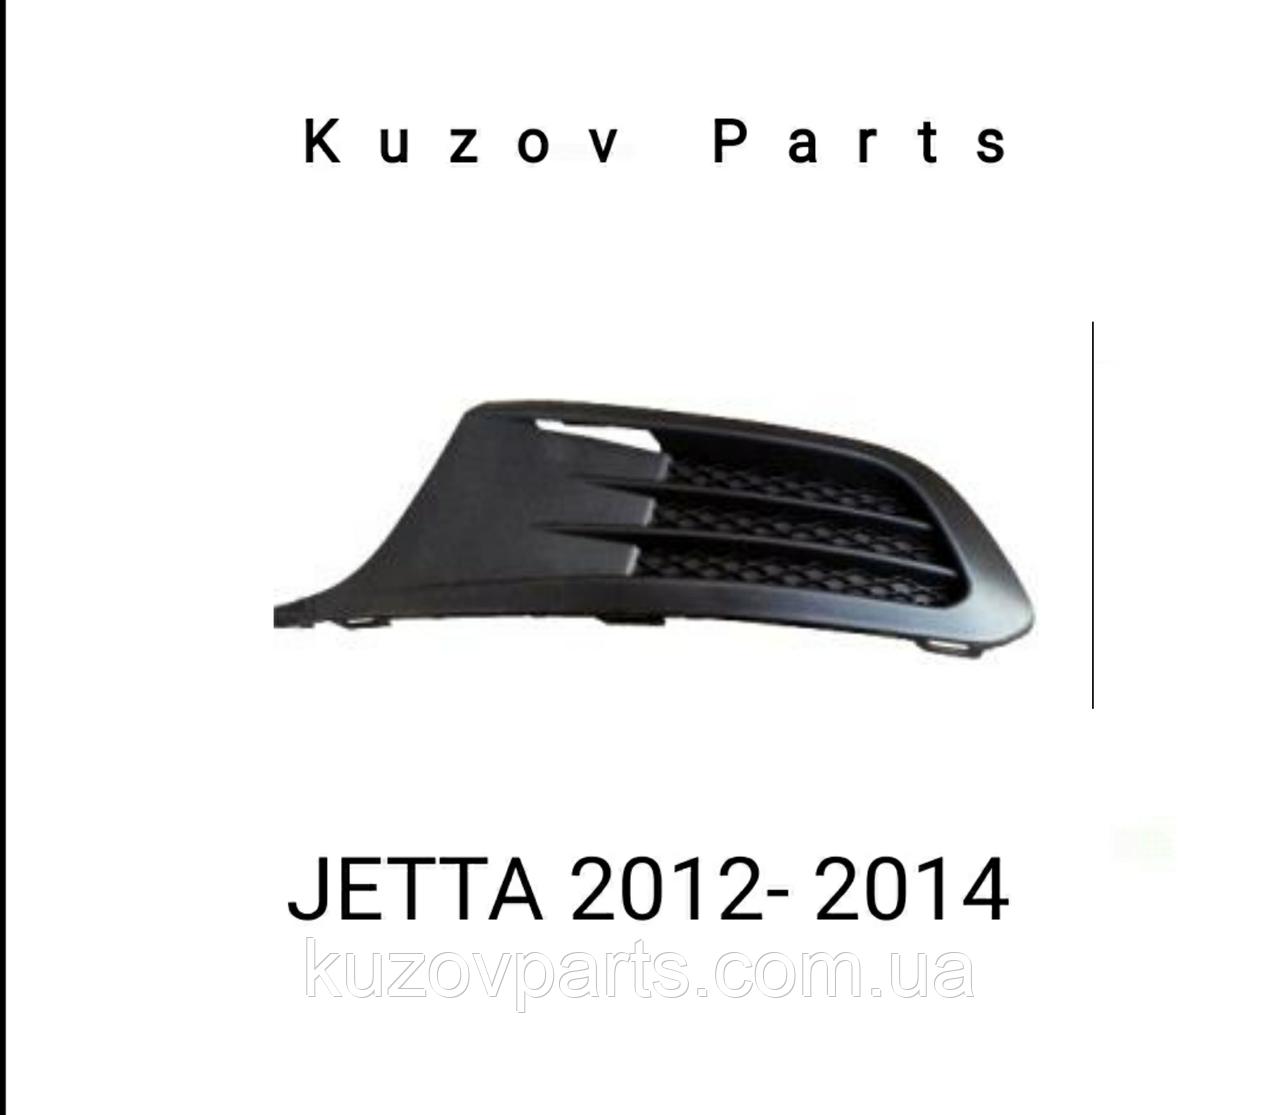 Заглушка туманки vw Volkswagen Jetta 2012 2013 2014 5C68536669B9